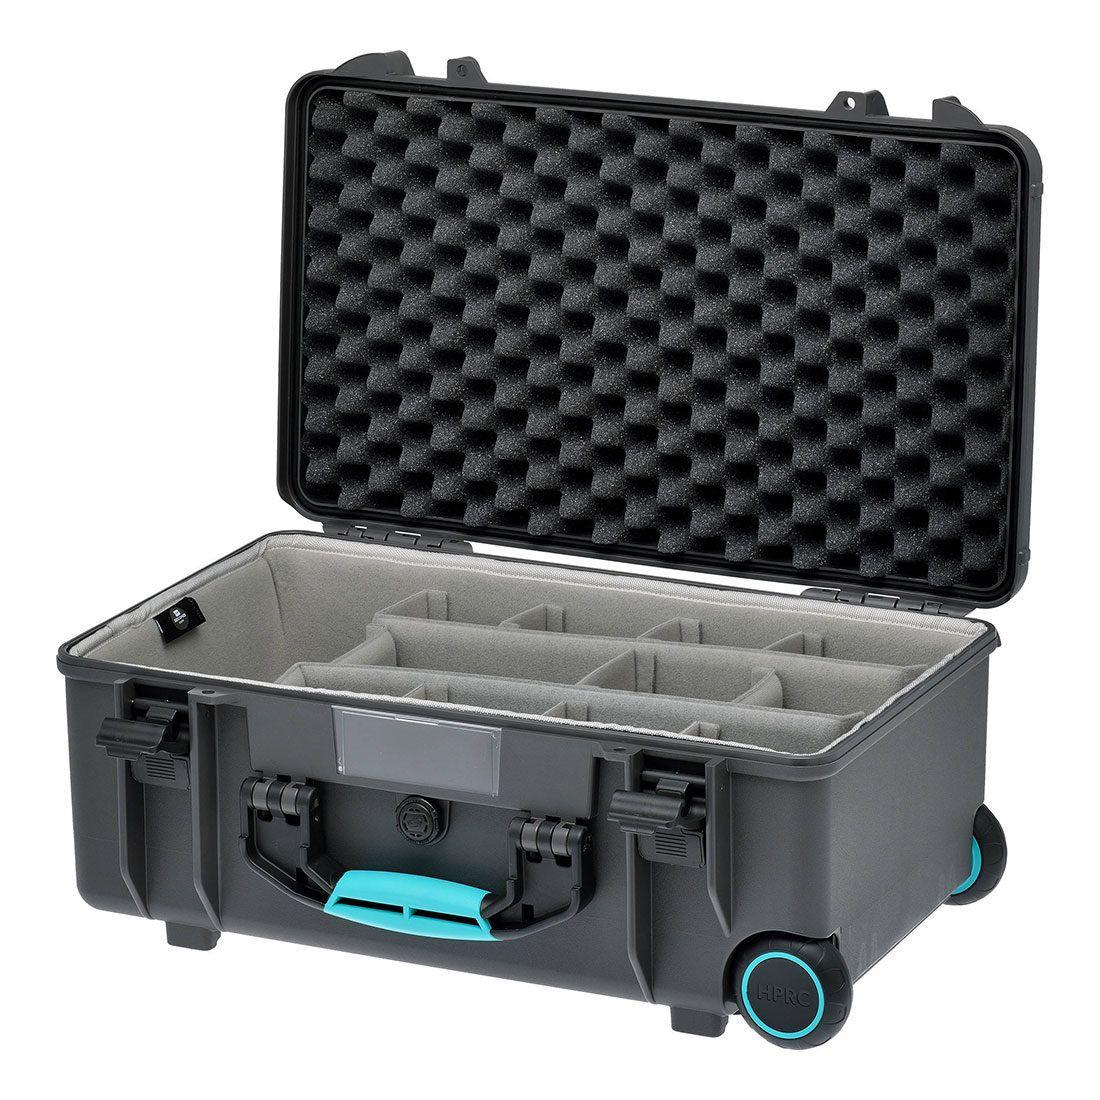 HPRC 2550W Kamera Trolley   Cameranu NL